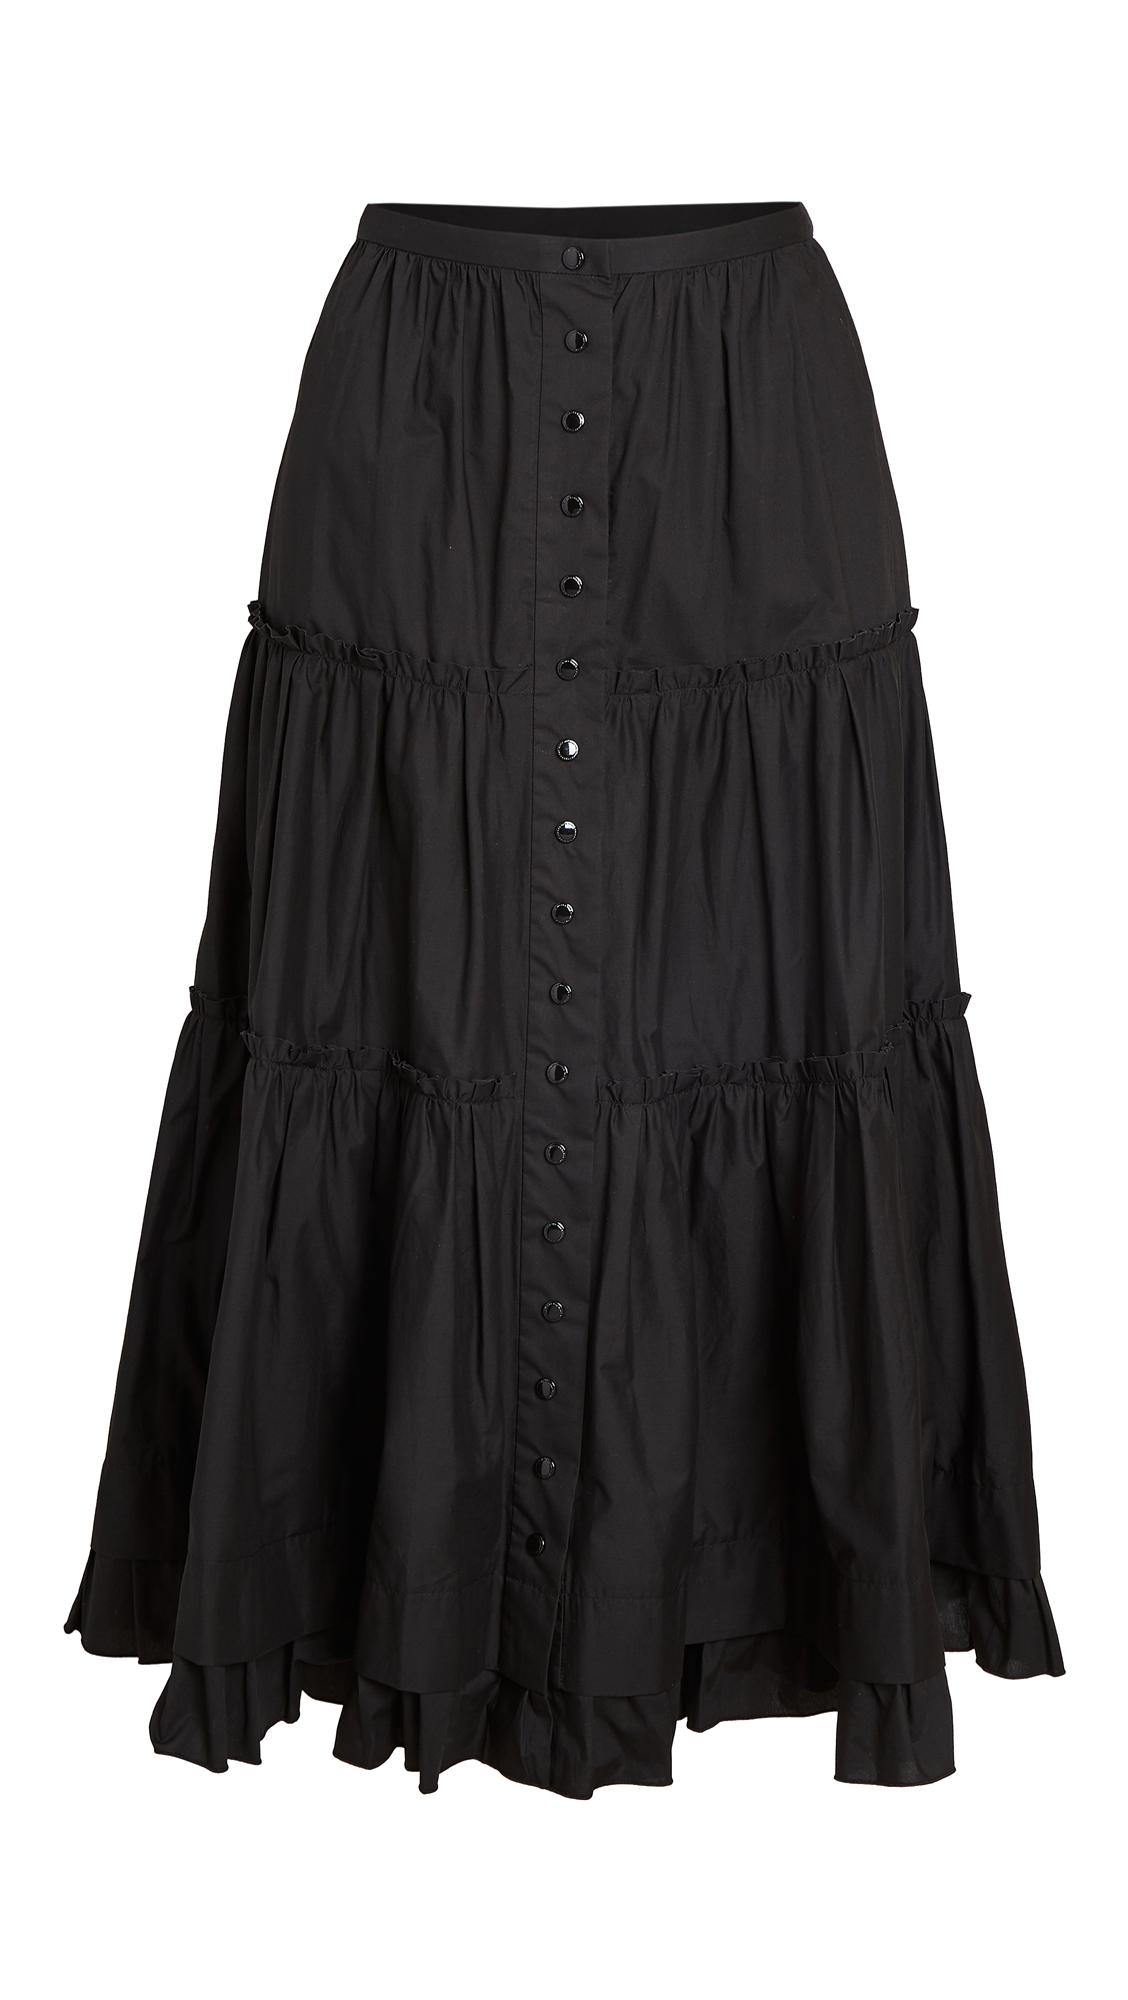 The Marc Jacobs The Prairie Skirt